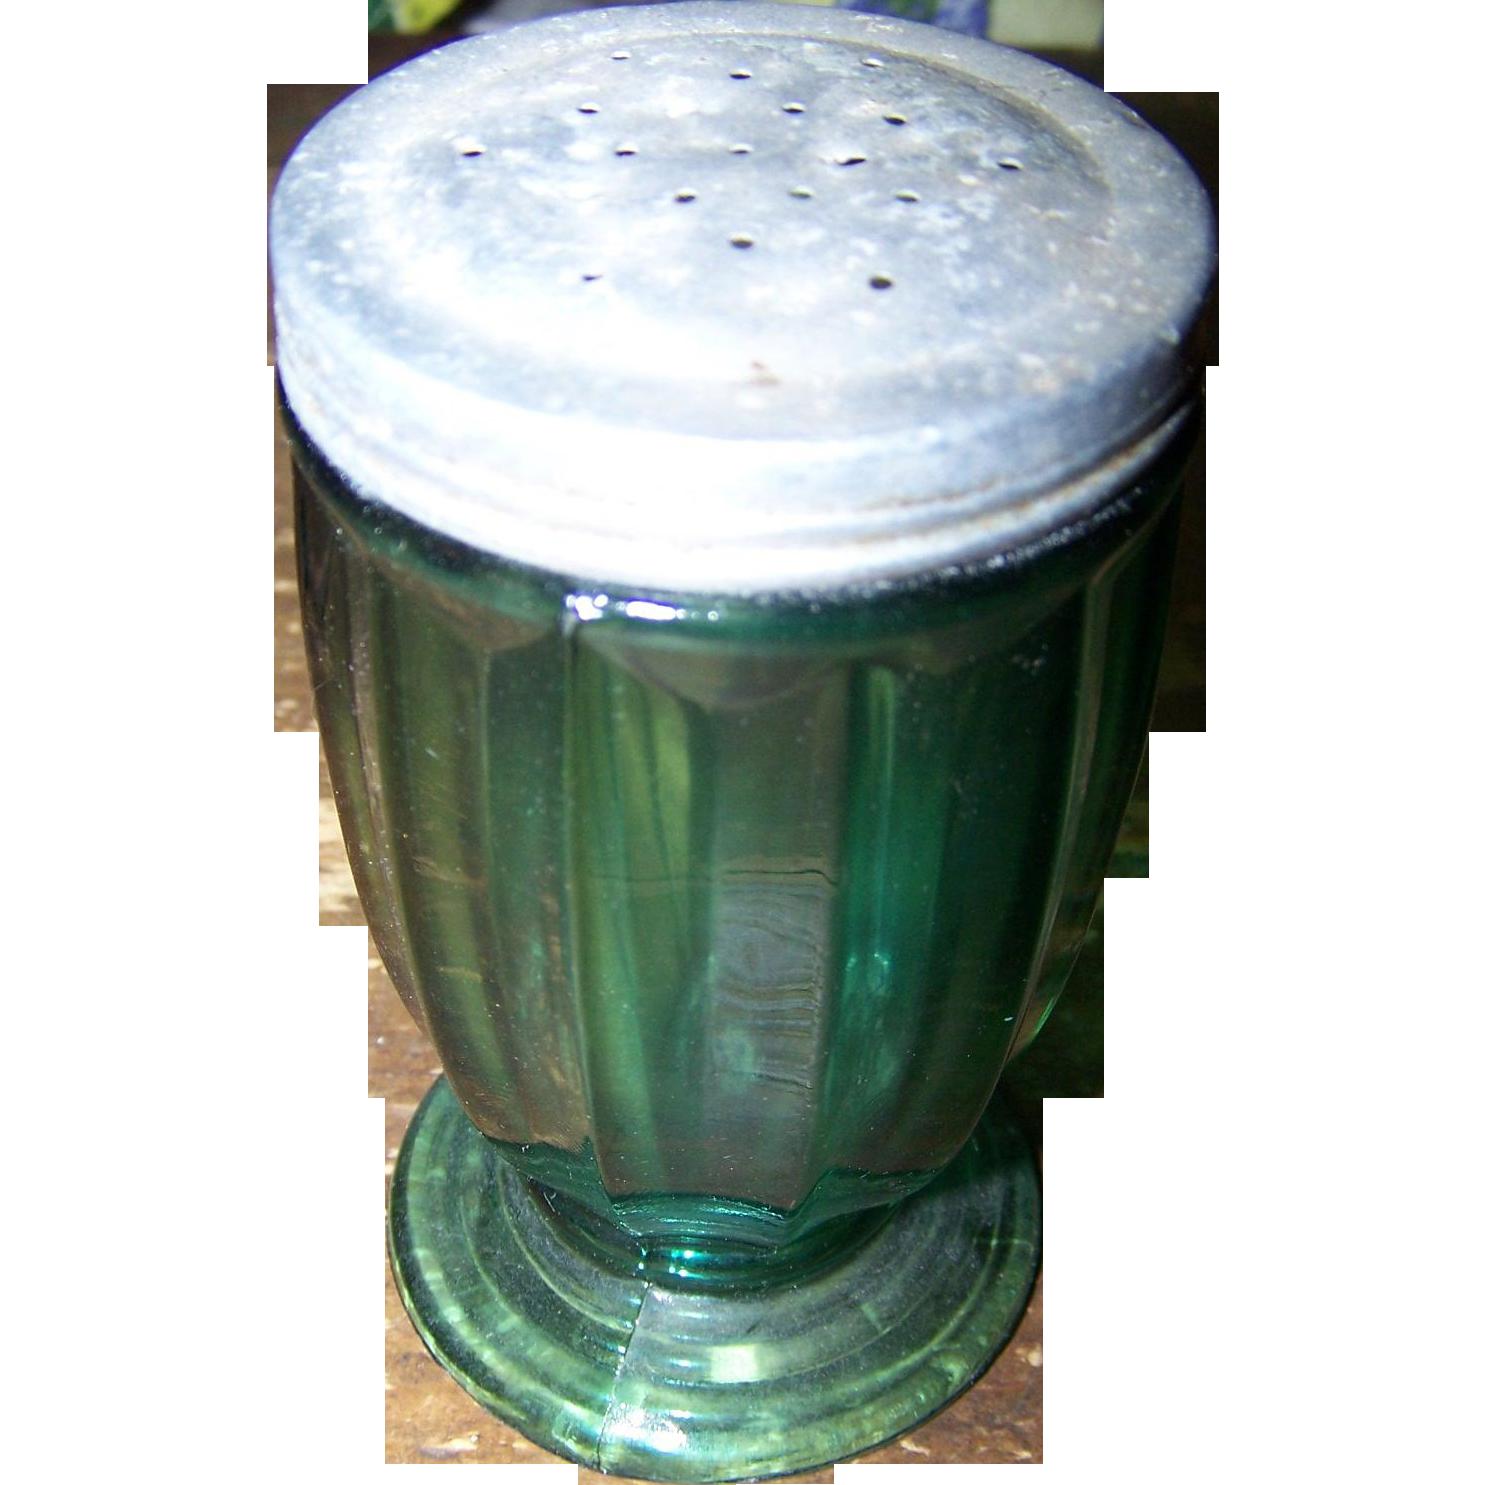 Jeanette Glass Jenny Ware Ultramarine Green Shaker with Lid